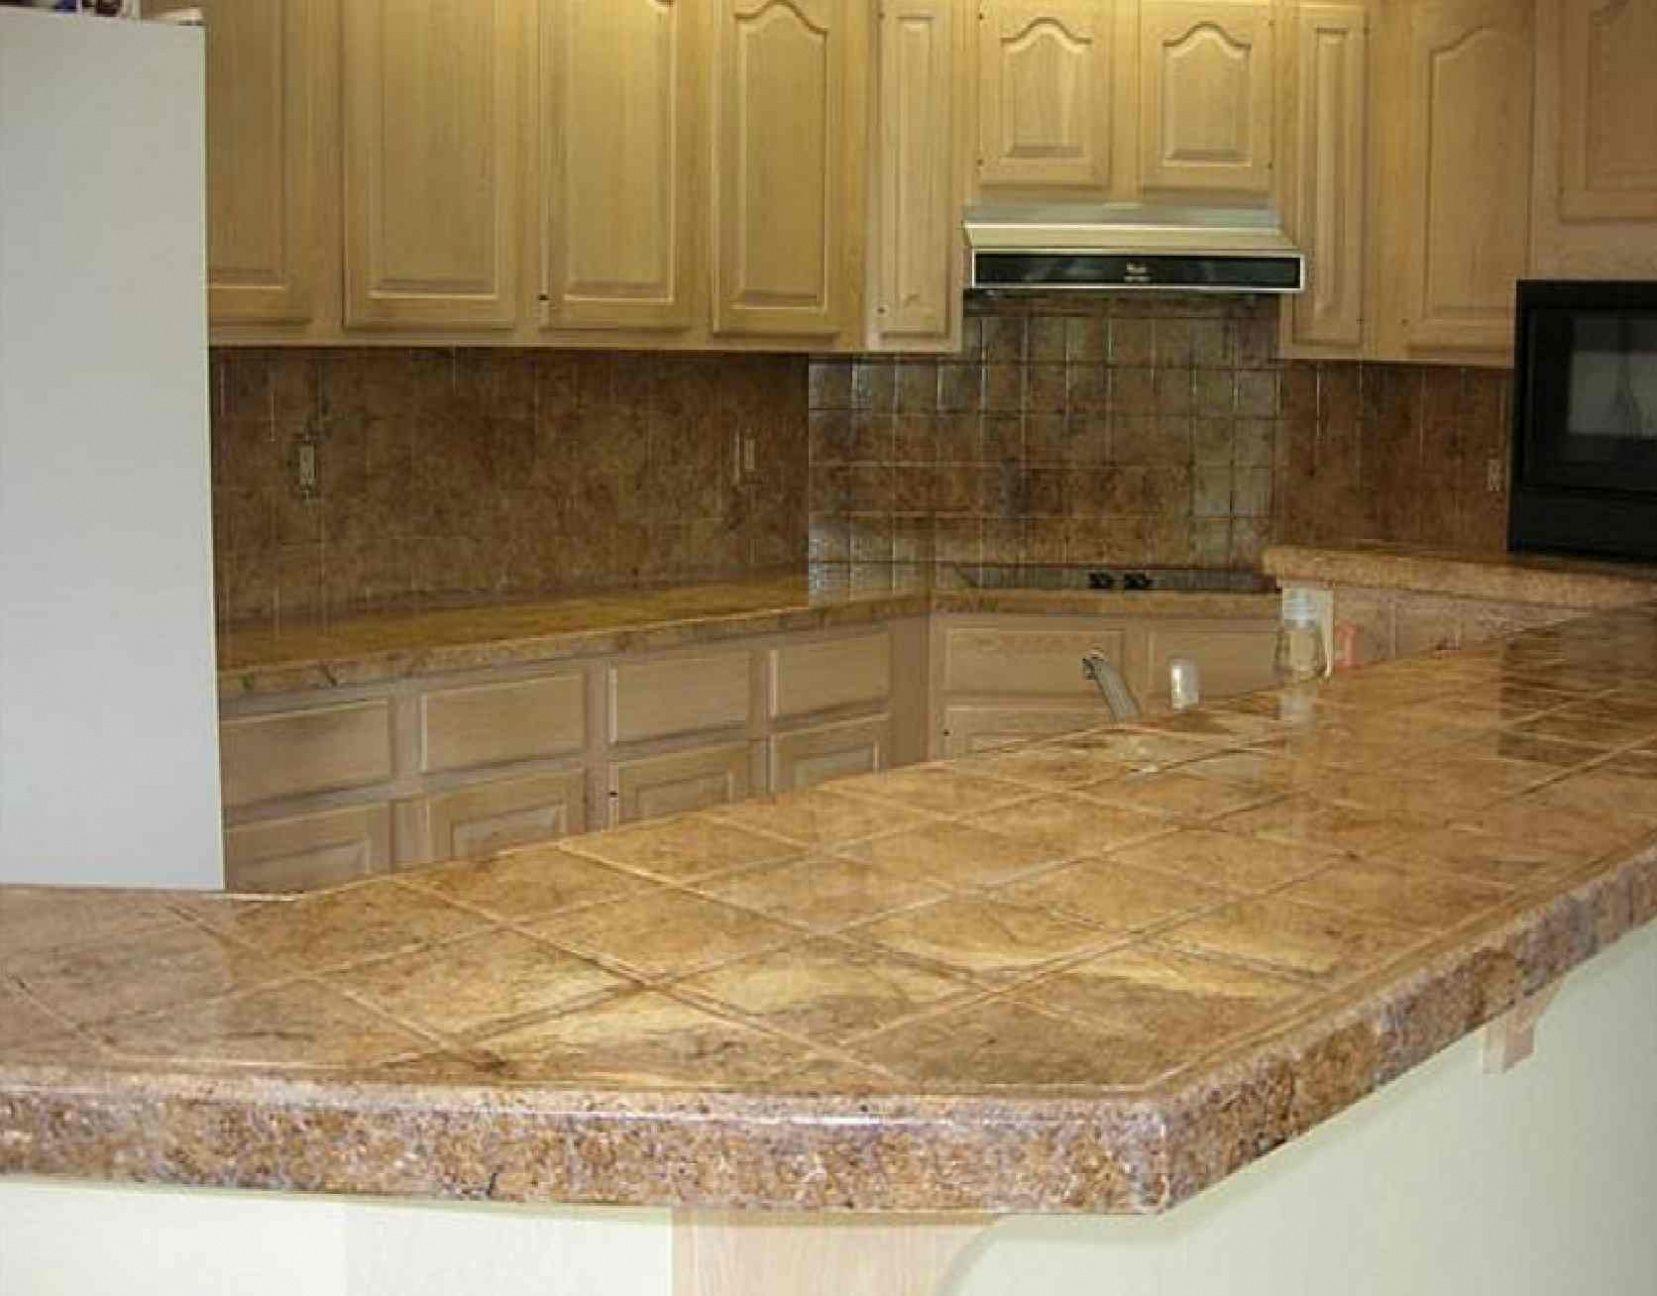 countertop marble with glass quartz grey backsplash images gray tile combinations kitchen countertops